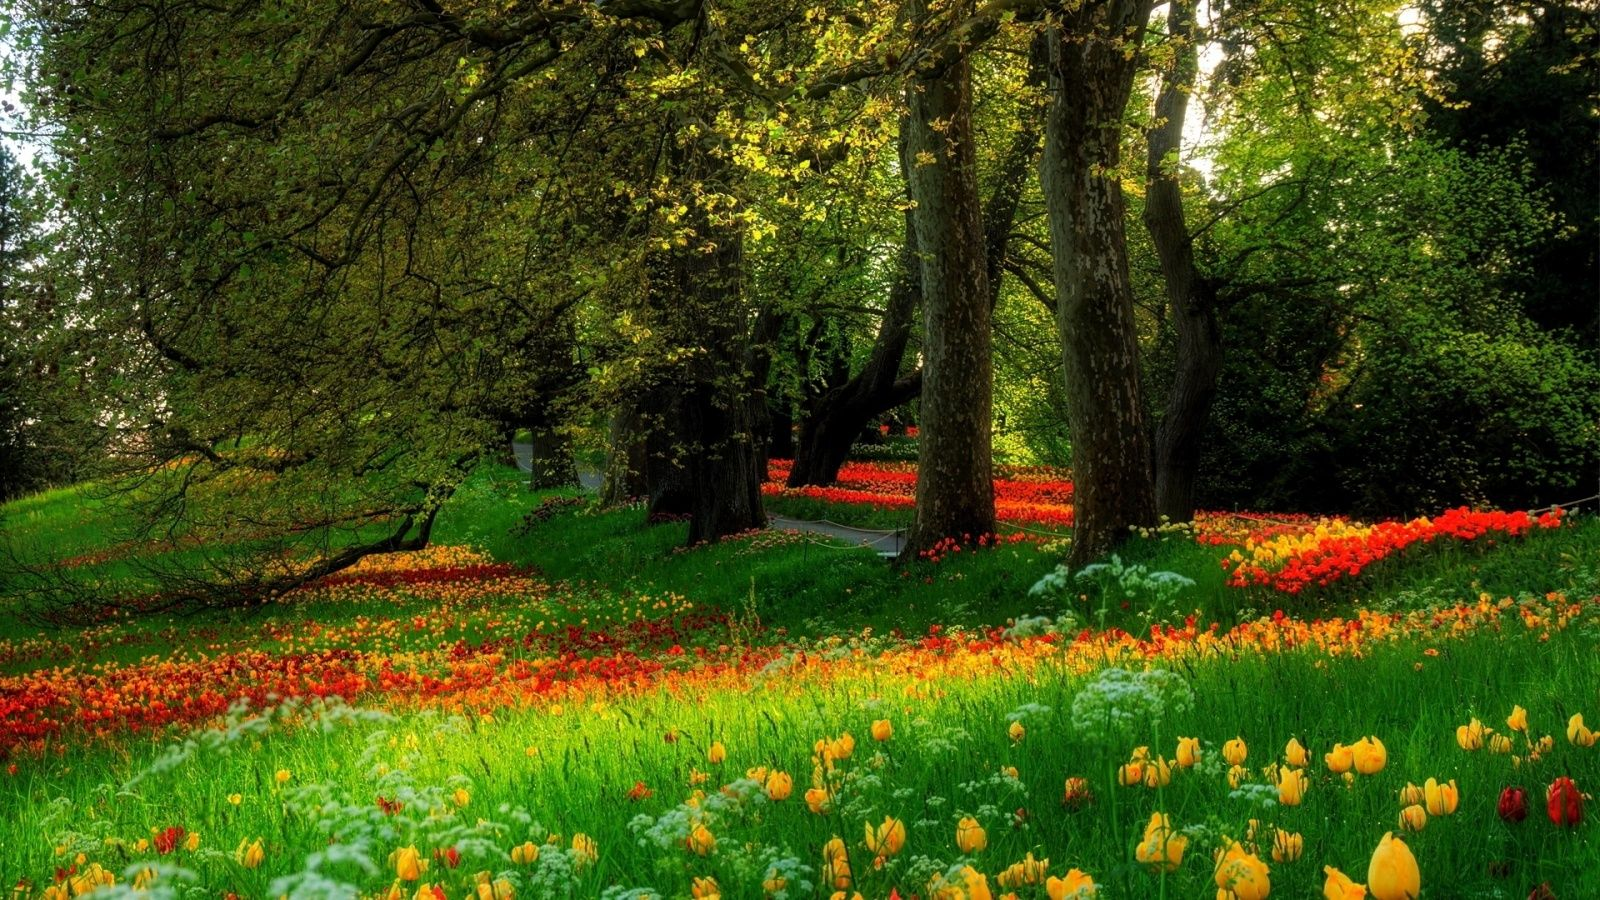 Flowers Wallpapers Hd 1600x900 8 Flowers Wallpapers Hd 1600x900